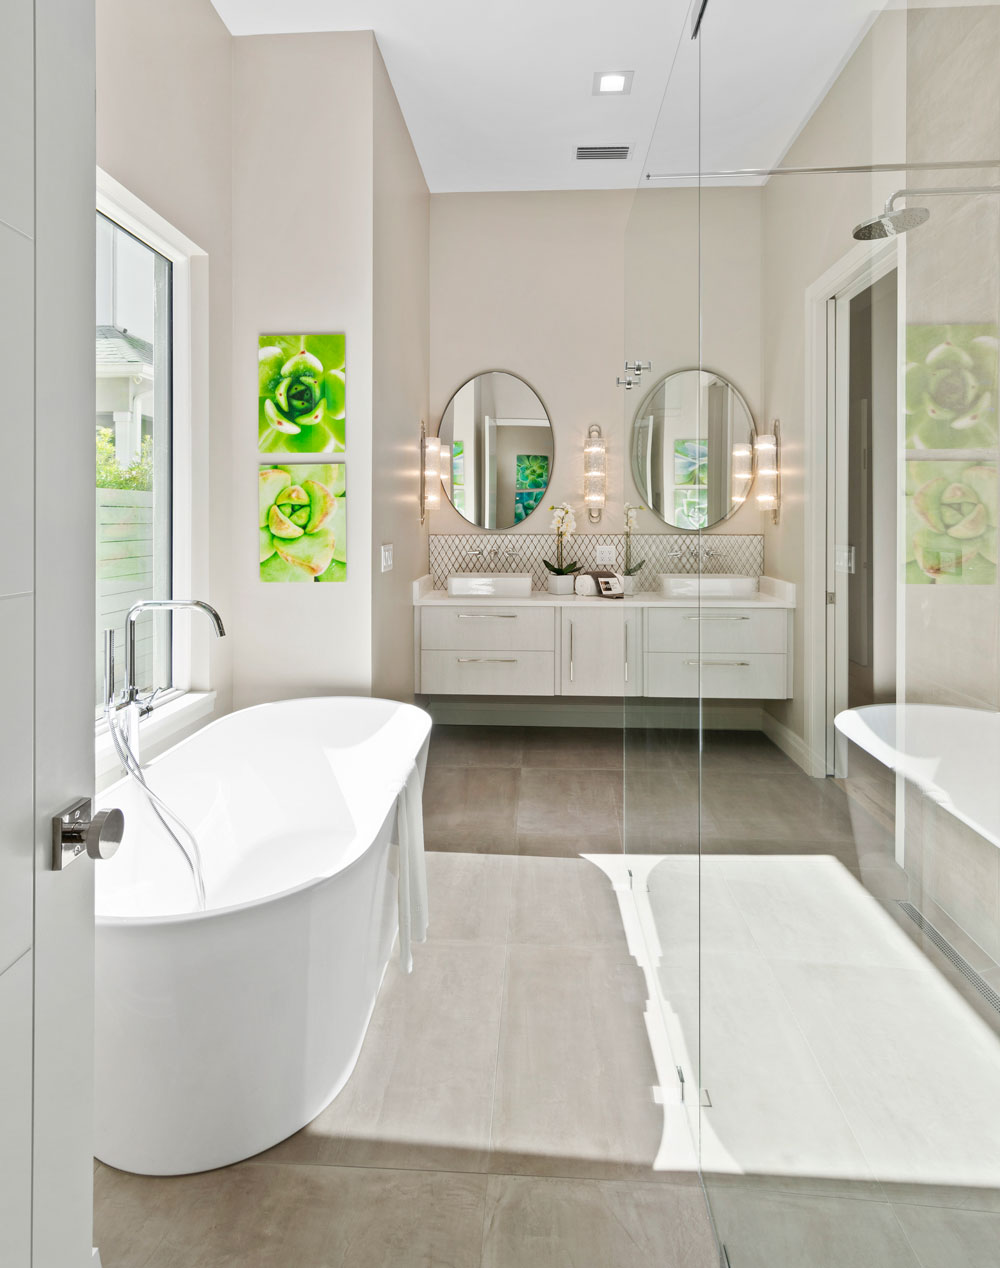 interior design header - bathroom design